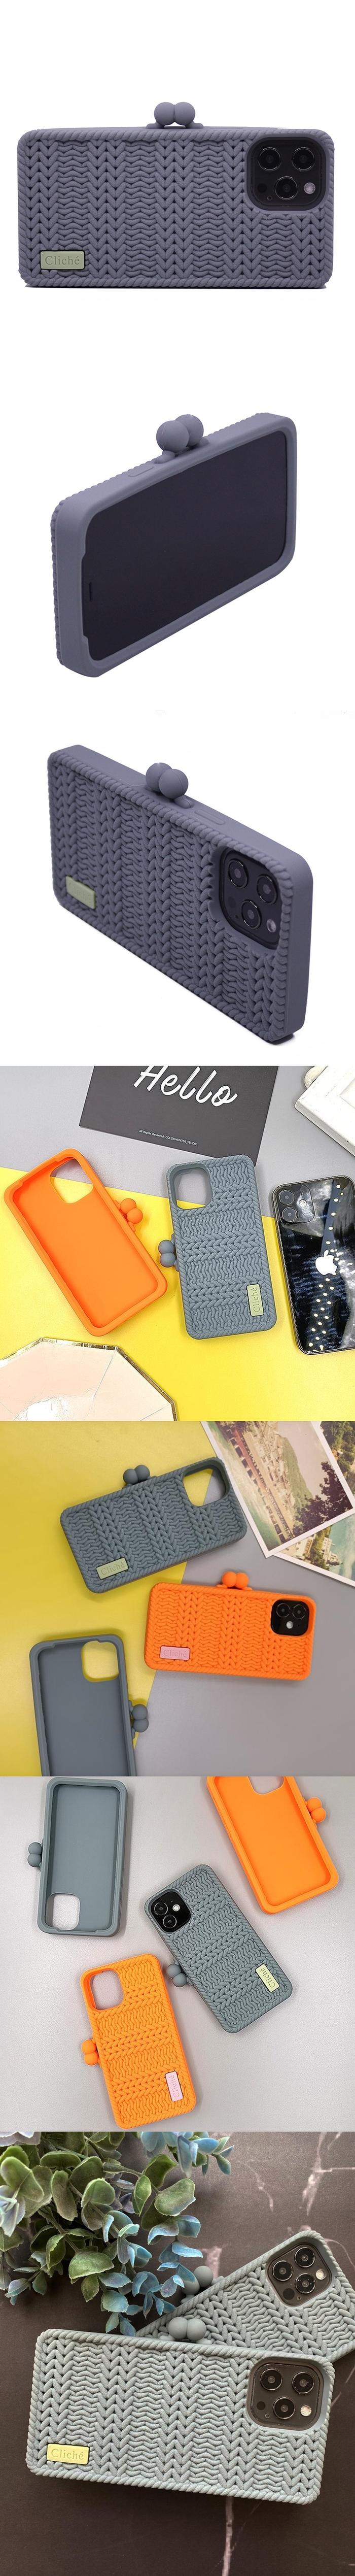 Candies|Cliche針織 雙珠扣錢包(灰) - iPhone 12 Pro Max